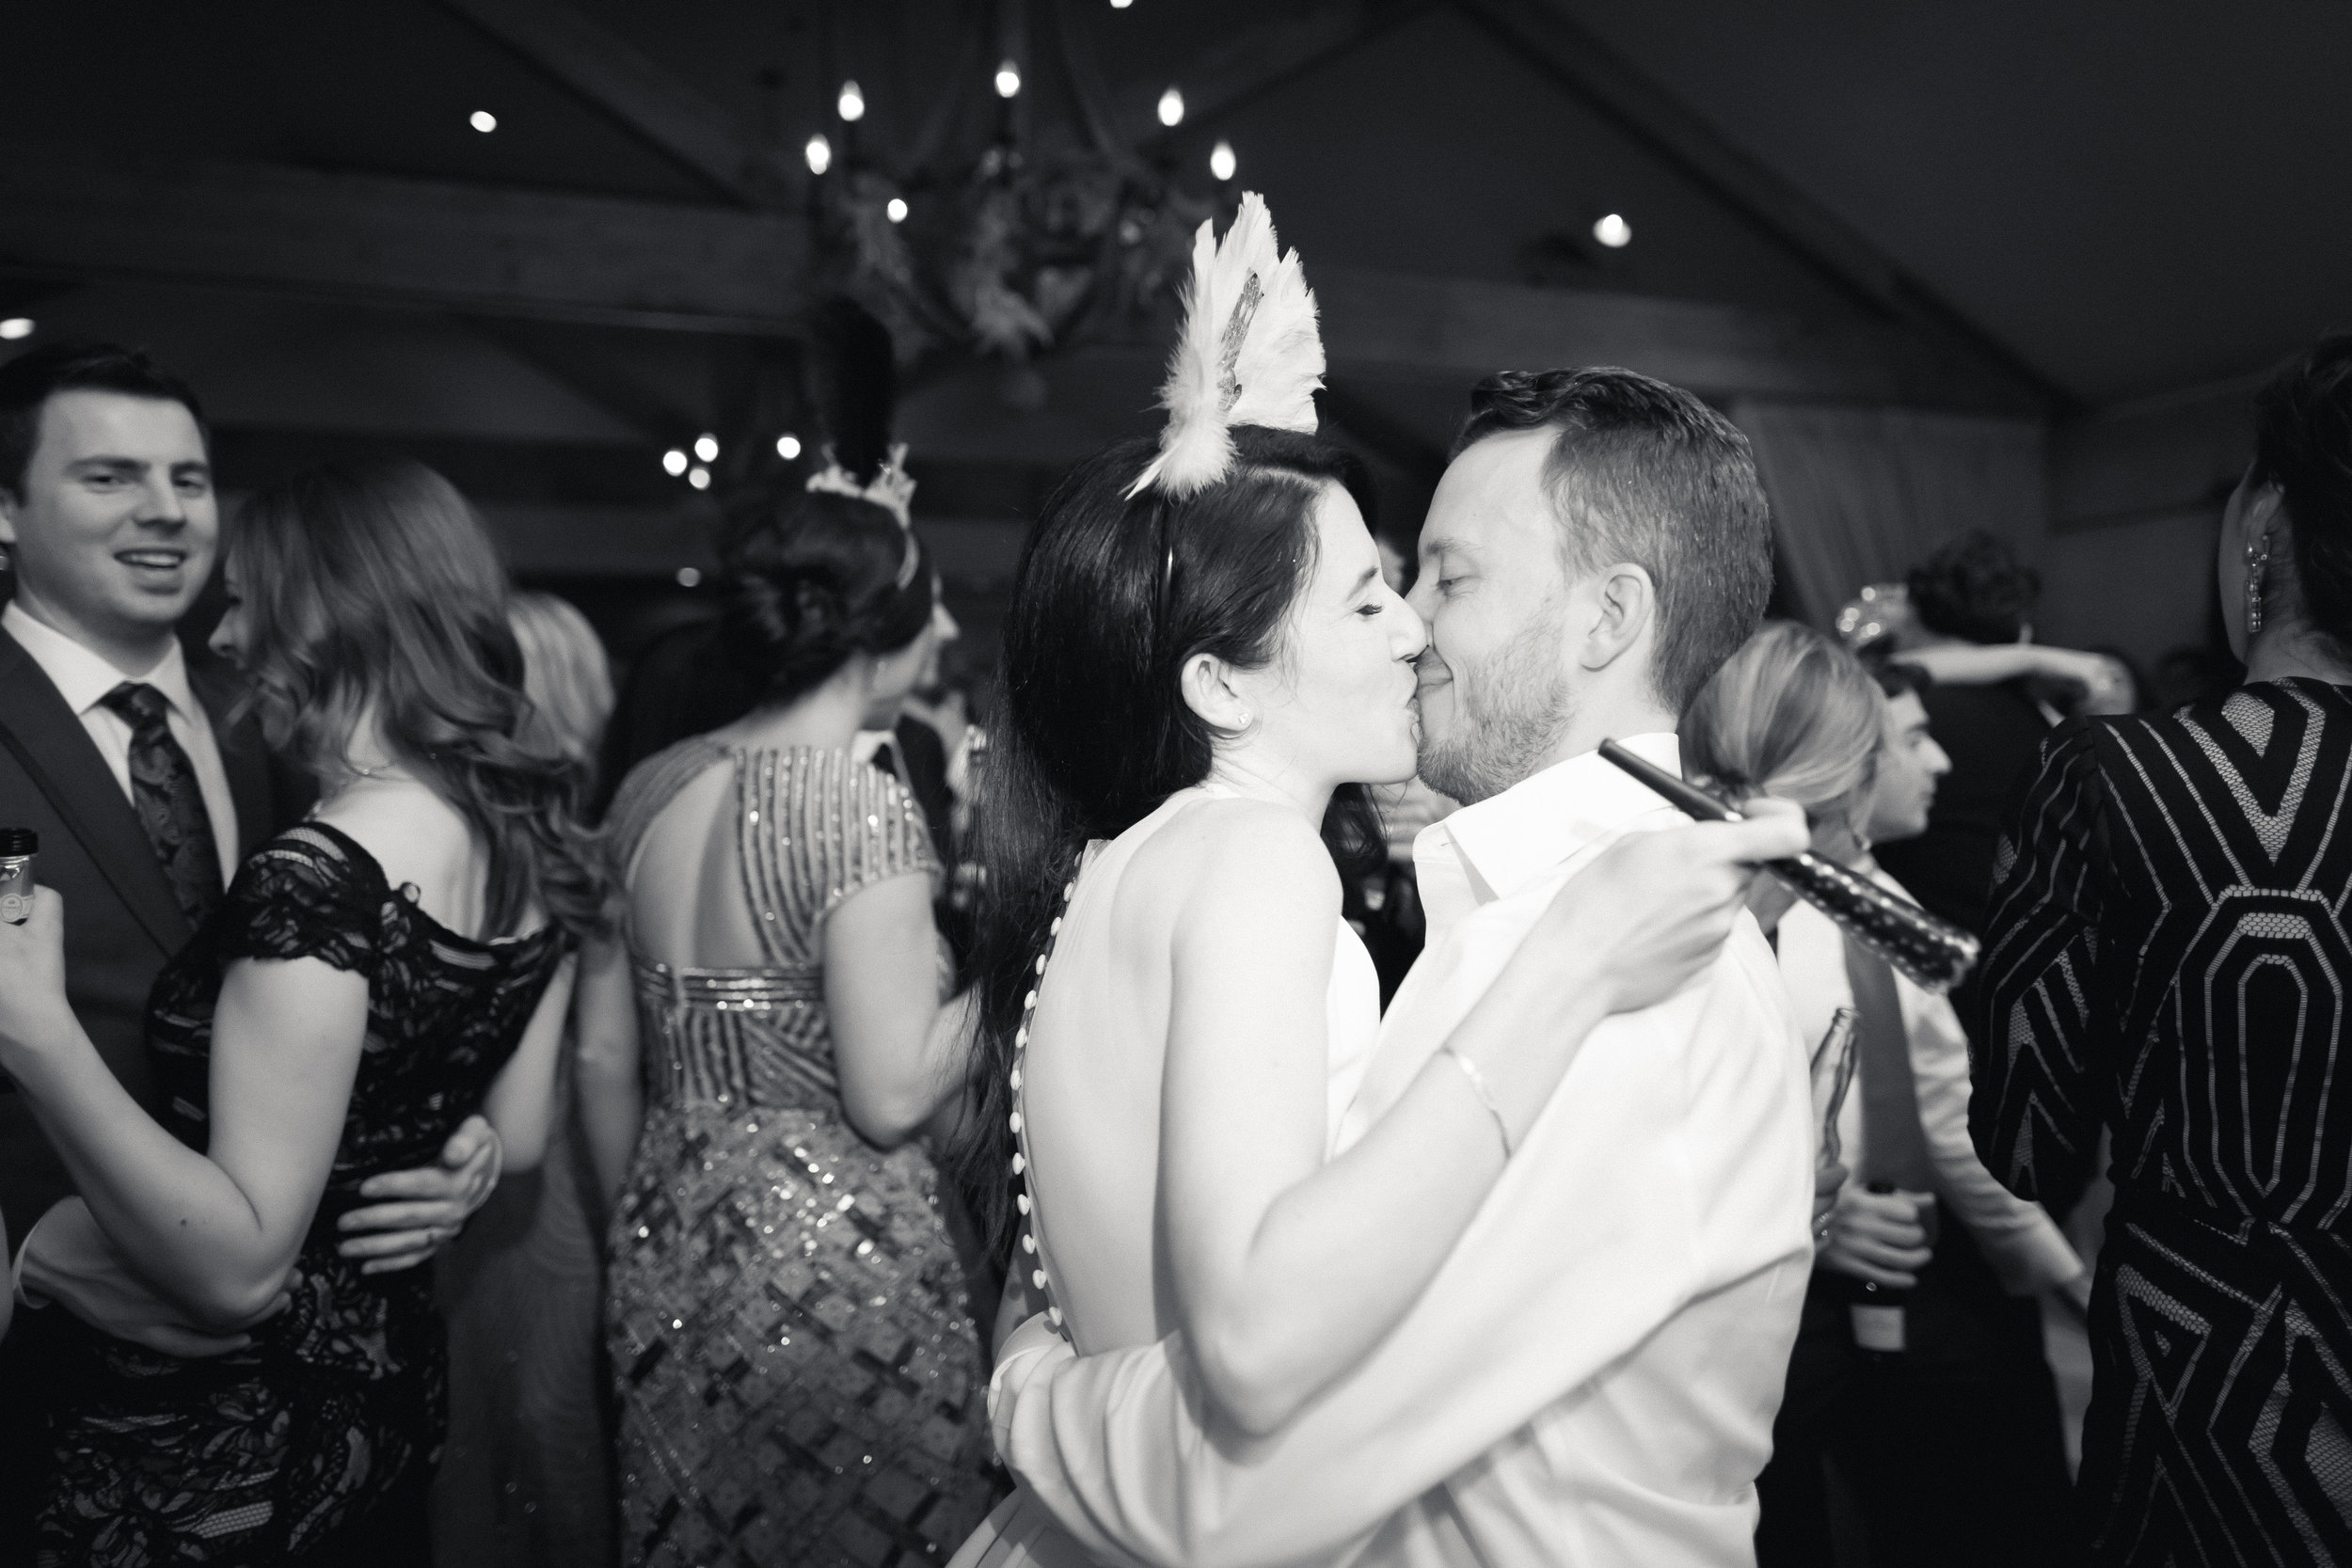 Coordination: Ashley Brand of   LVL Weddings & Events  // Photography:  Grace Havlak Photography  // Floral Design:  California Sister Floral Design Co  // Catering & Venue:  Ramekins   // Video:  Daniel Gruen Weddings  // Makeup:  Artistry By Danika  // Rentals:  Bright Event Rentals  // Entertainment:  AMS Entertainment